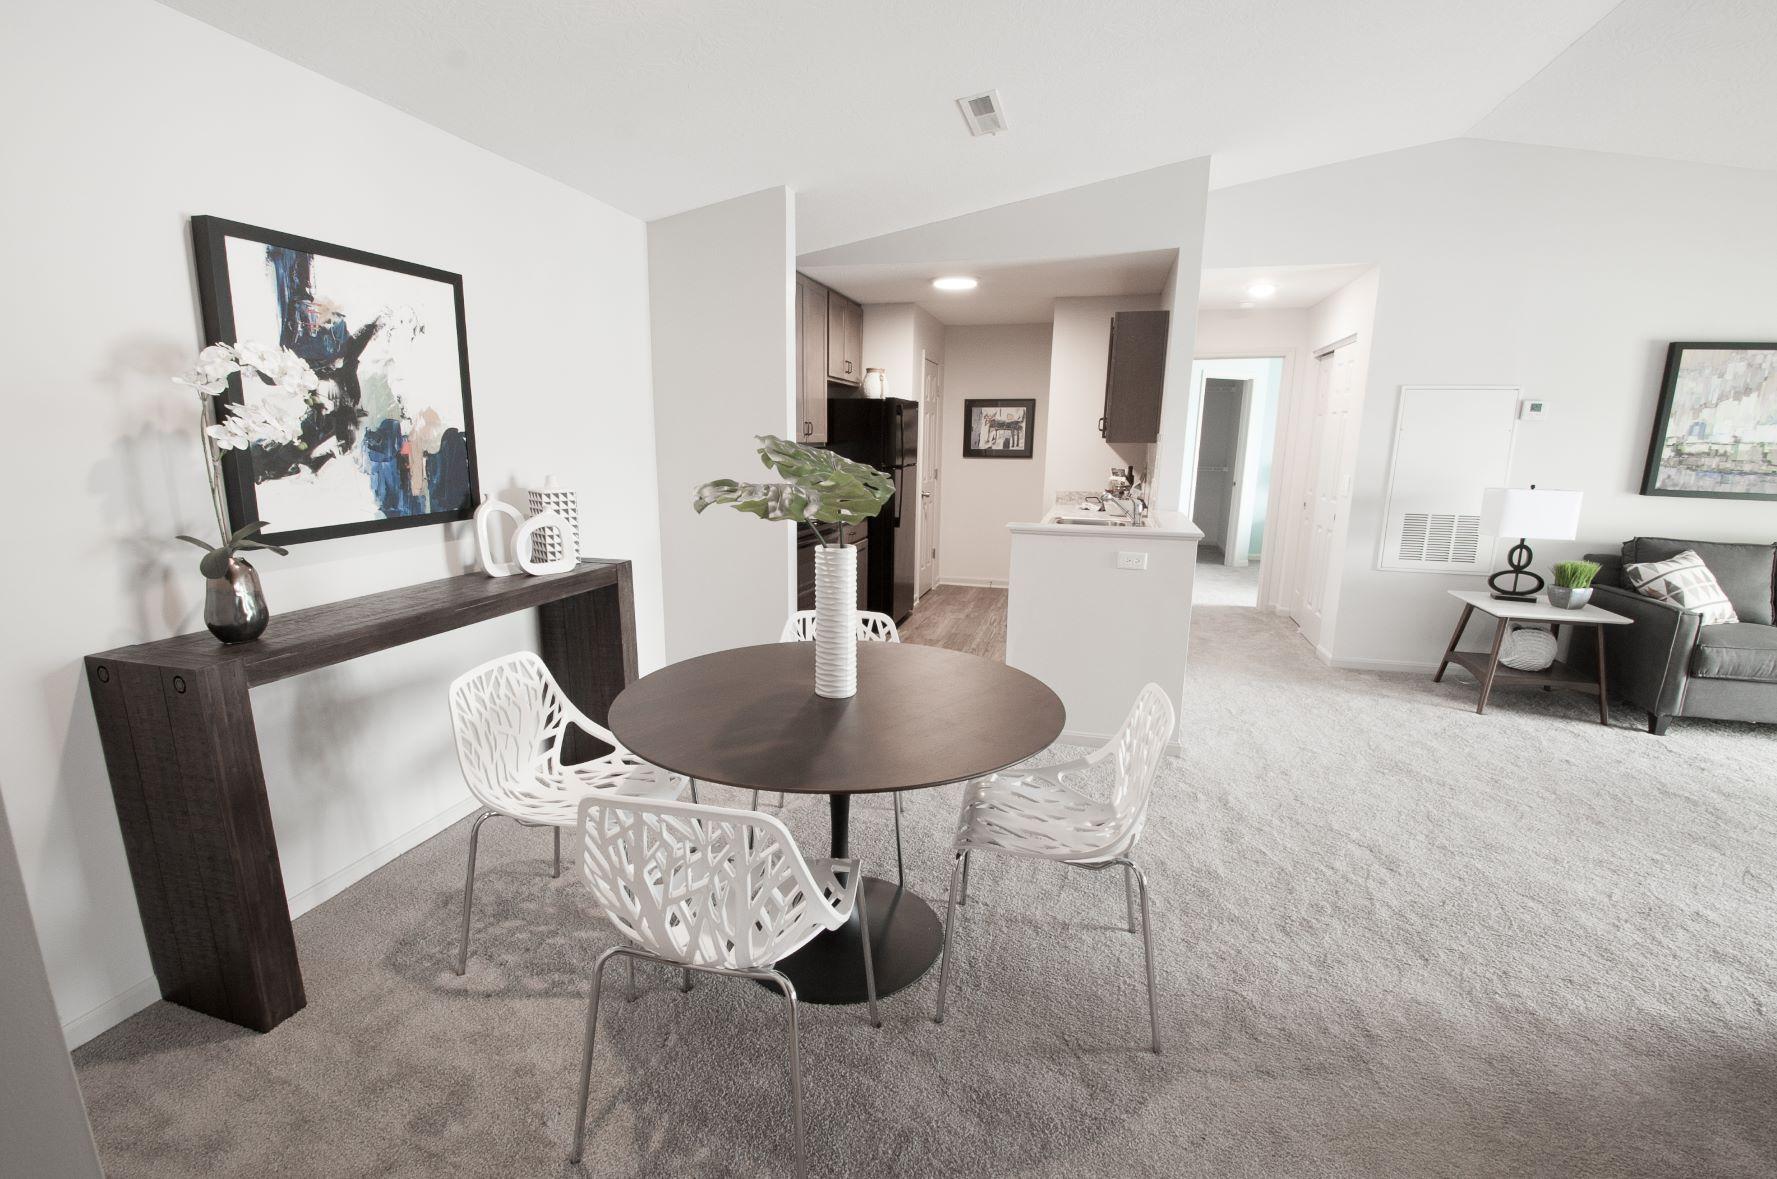 Open Floor Plans at Stone Bridge Apartments in Mason, Ohio